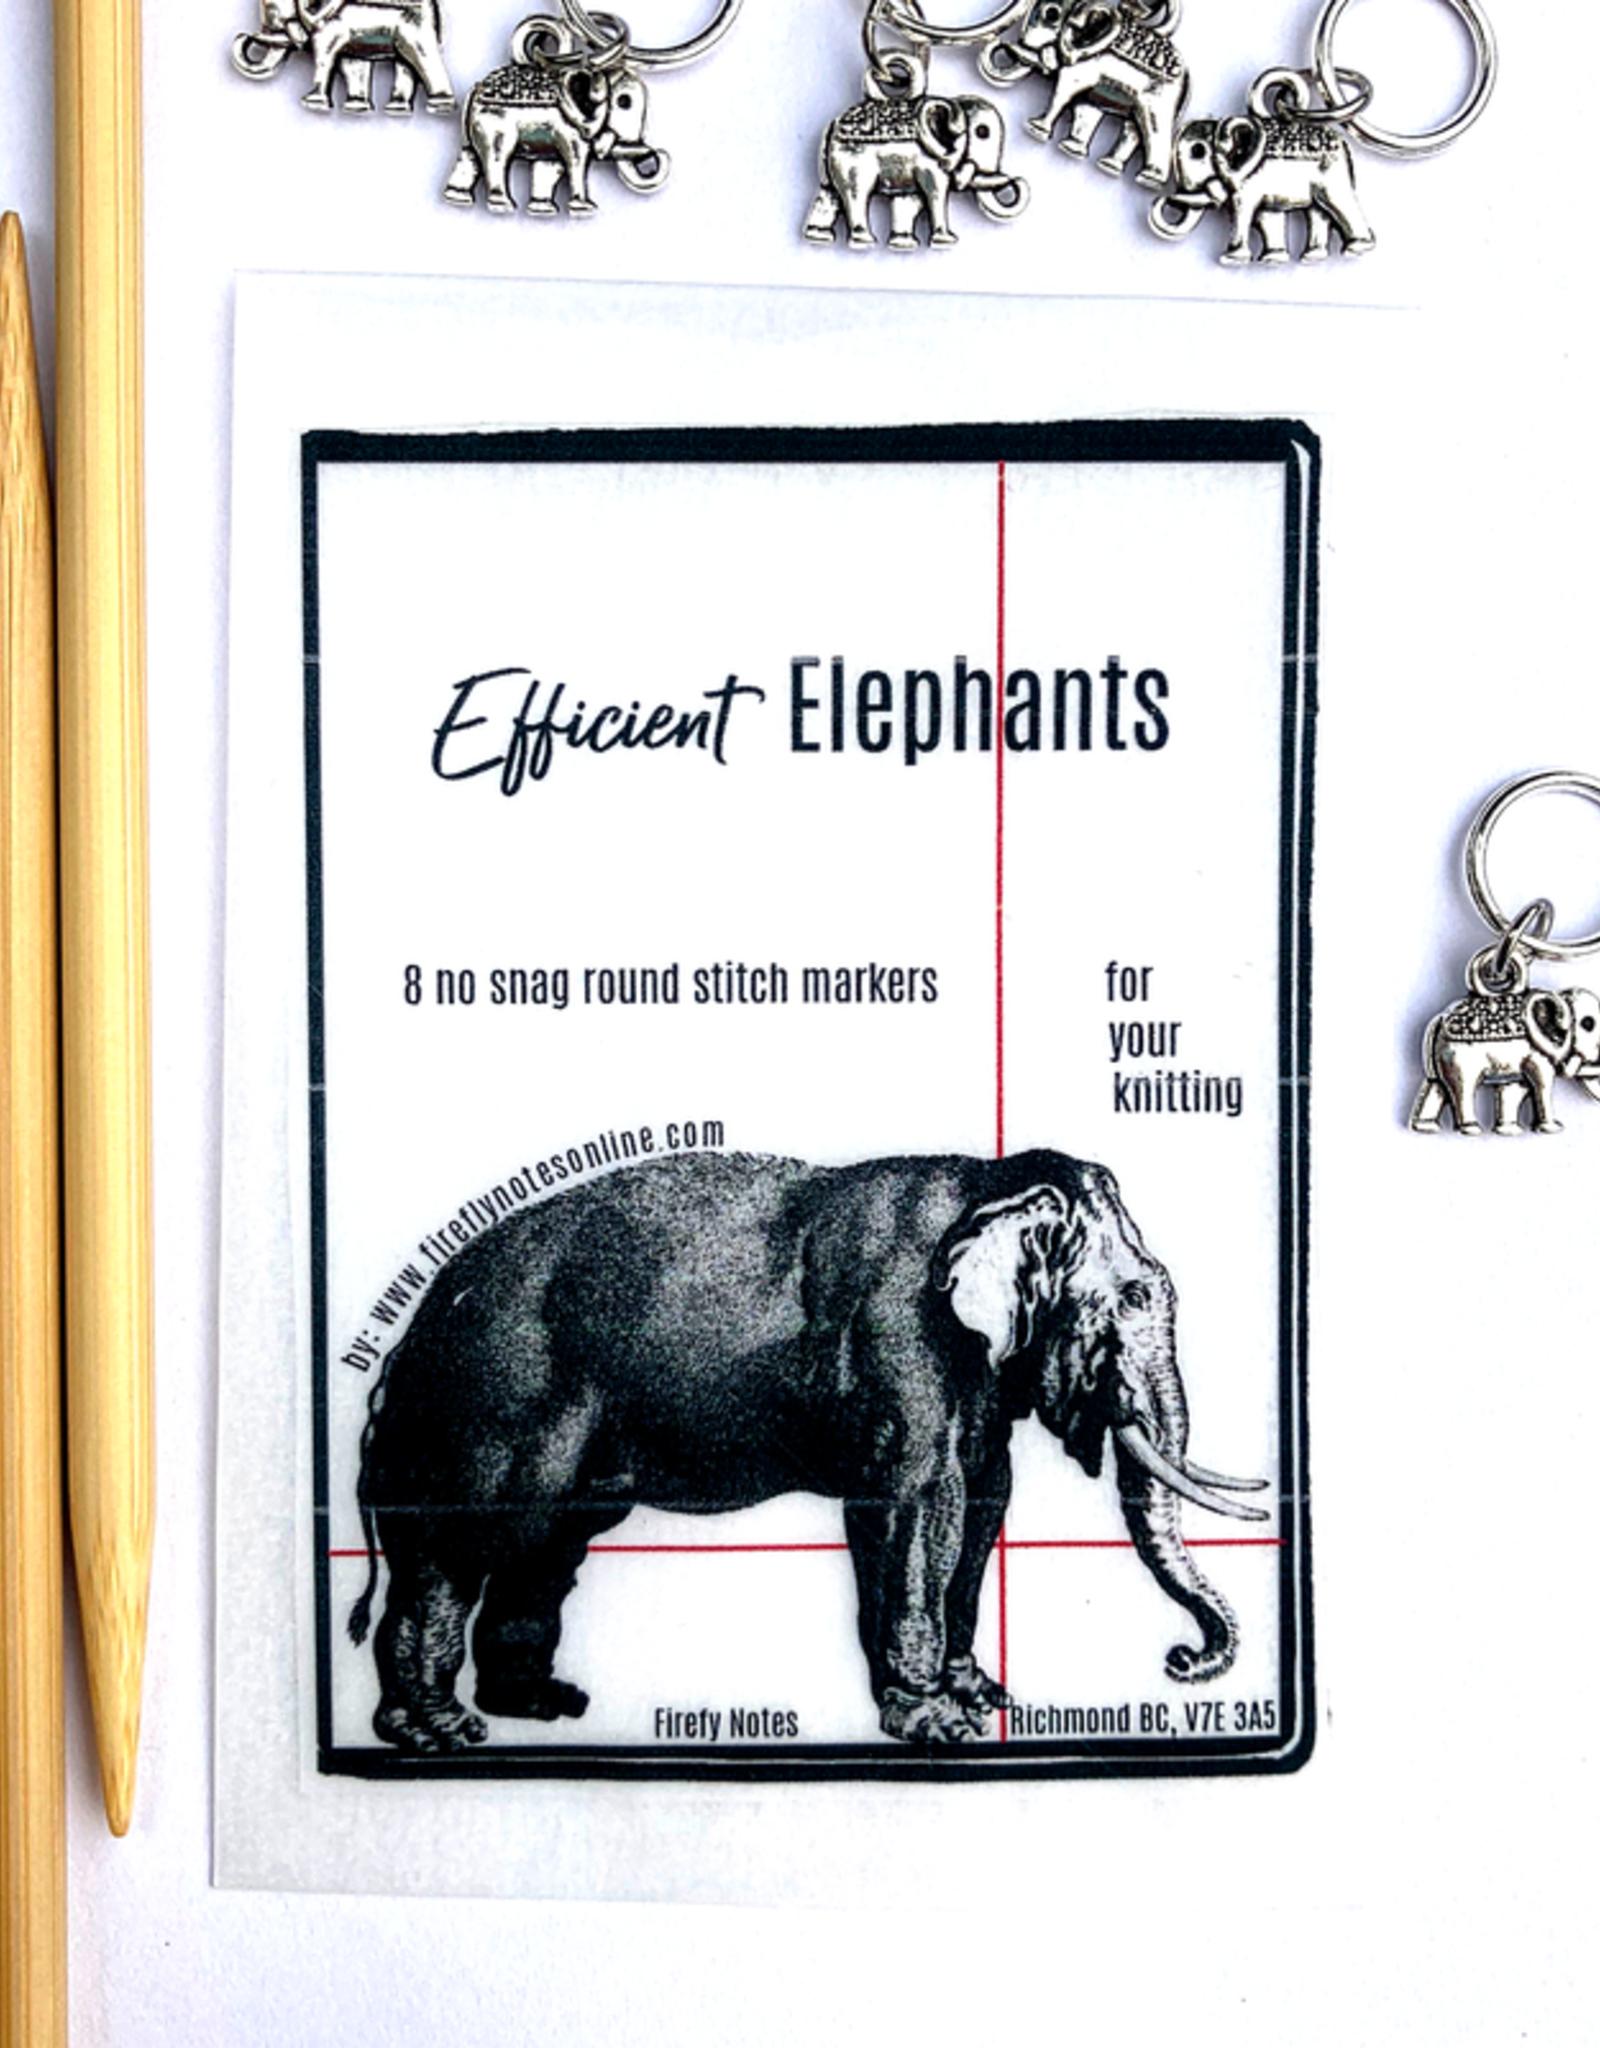 Firefly Notes - Efficient Elephants